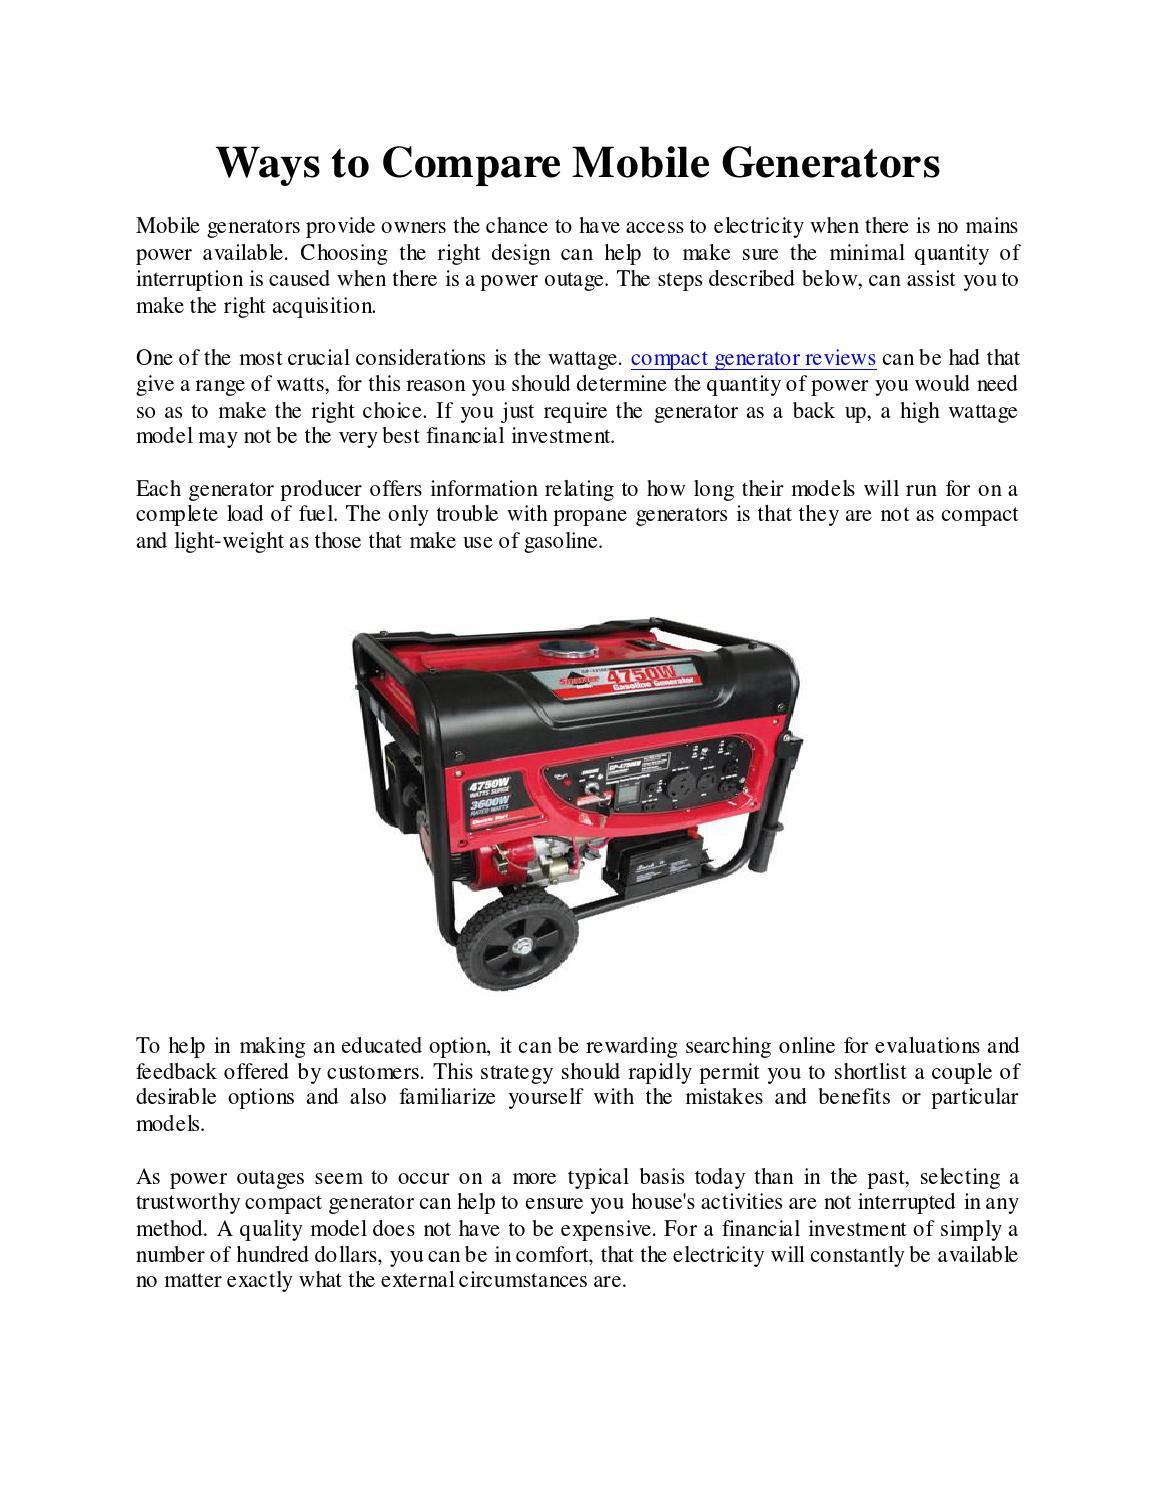 Ways To Compare Mobile Generators By Espressojack Issuu